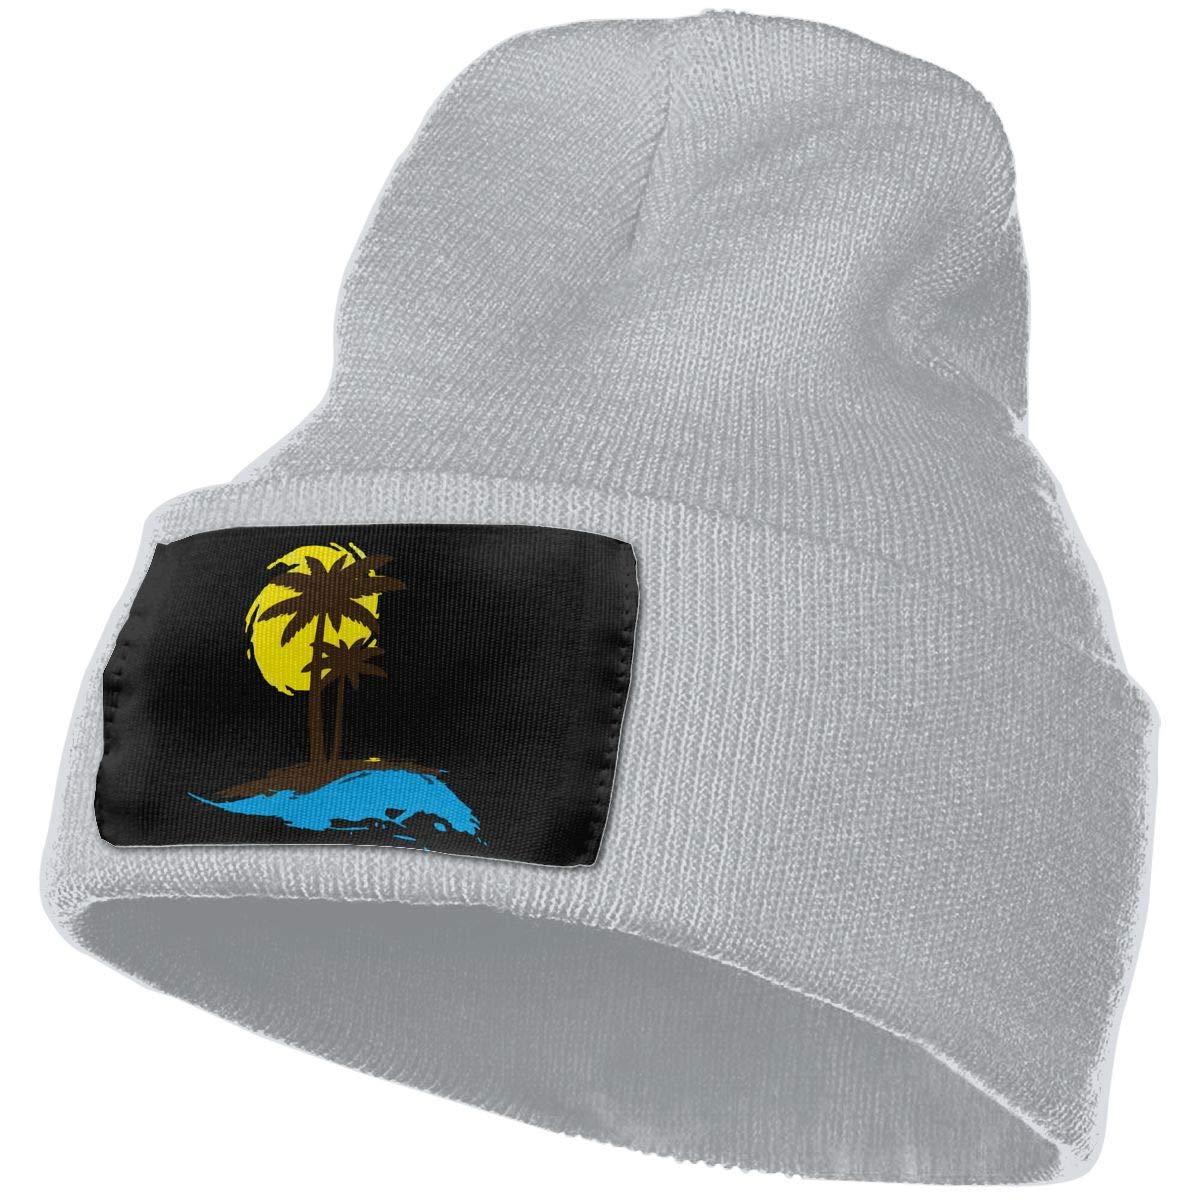 Sunset and Palm Trees Men /& Women Knitting Hats Stretchy /& Soft Ski Cap Beanie